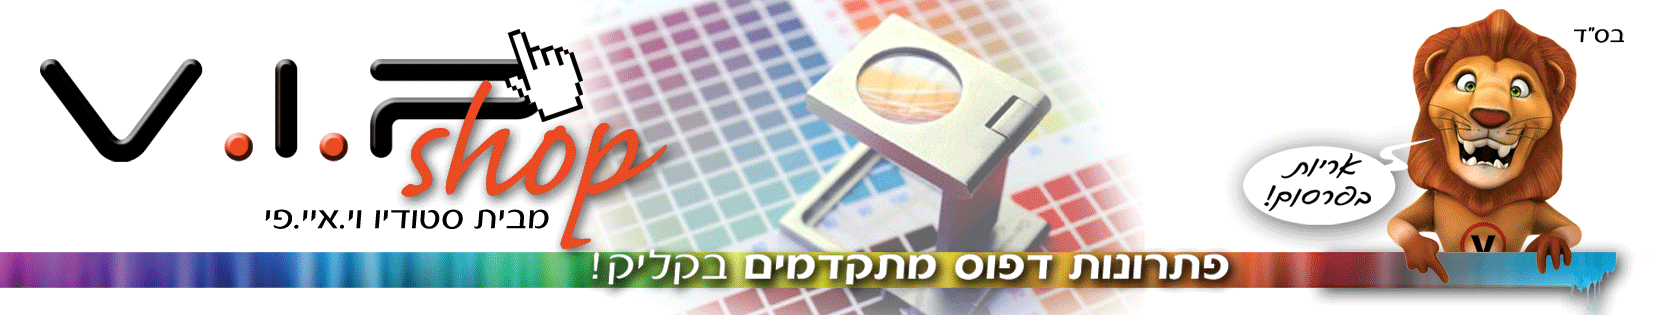 vipSHOP - פתרונות דפוס מתקדמים בקליק